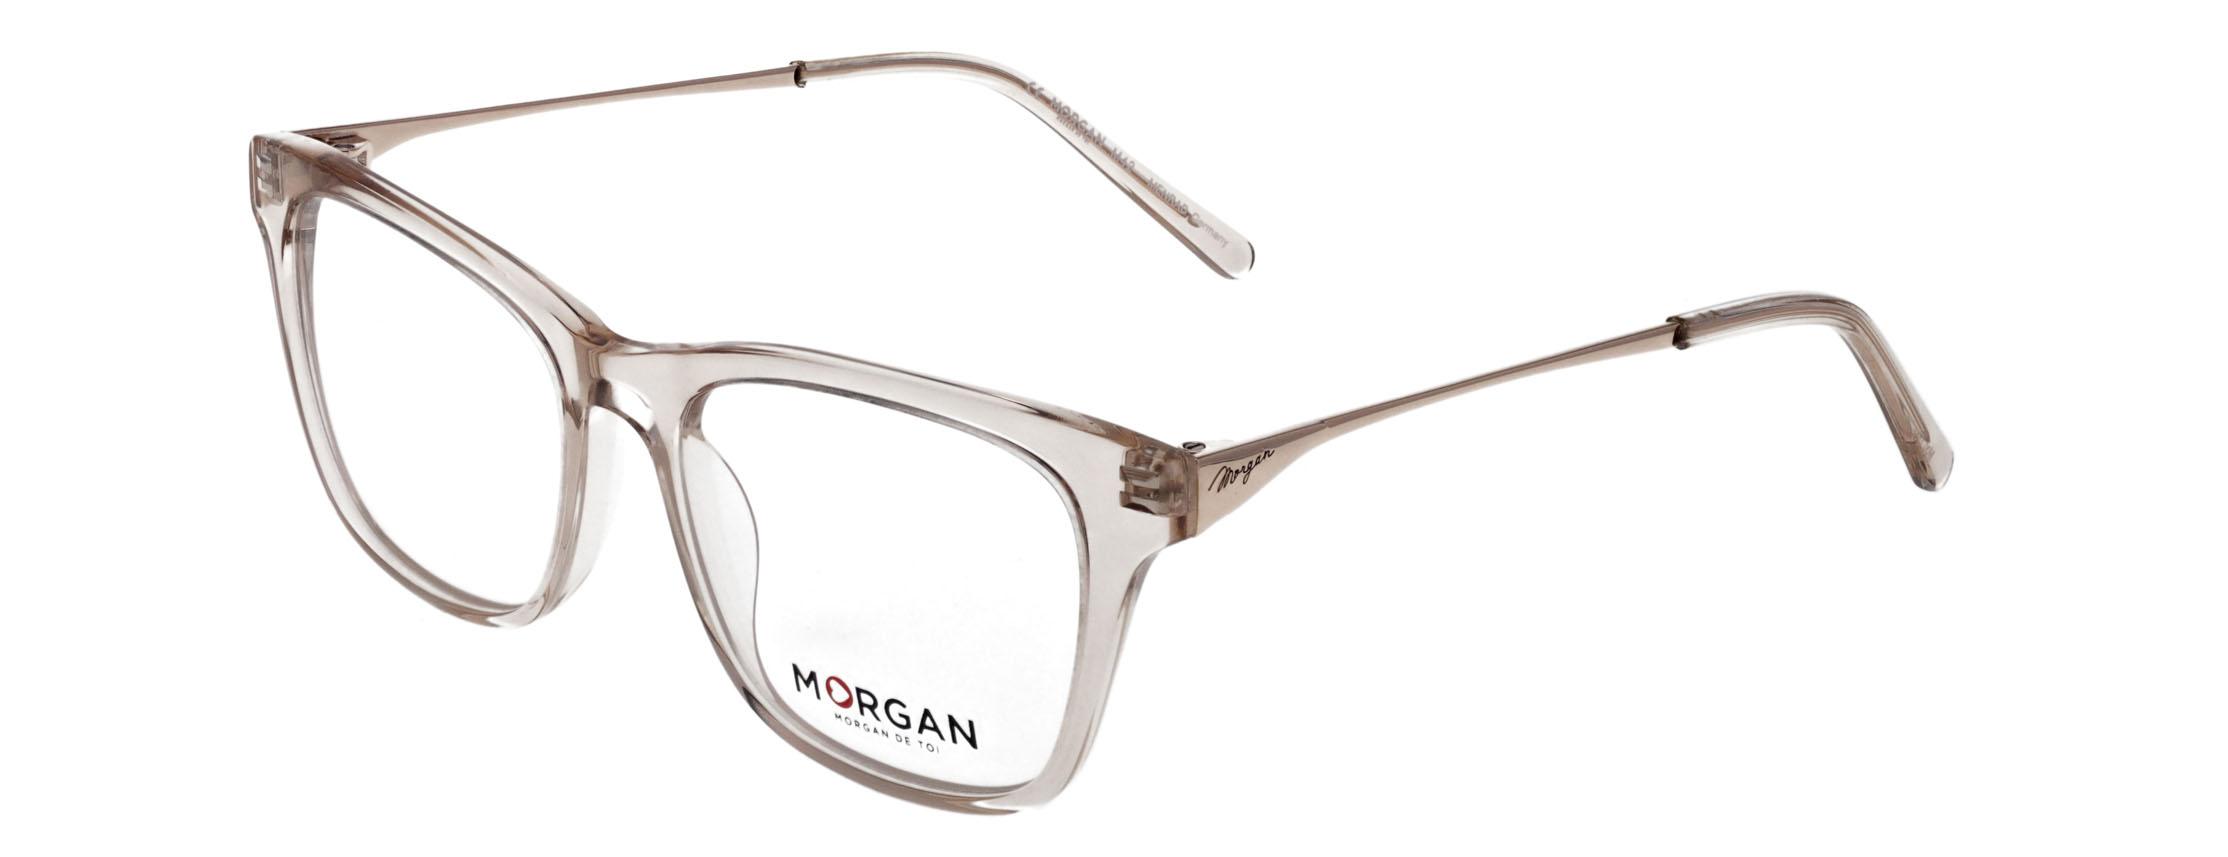 Morgan 202027 5500